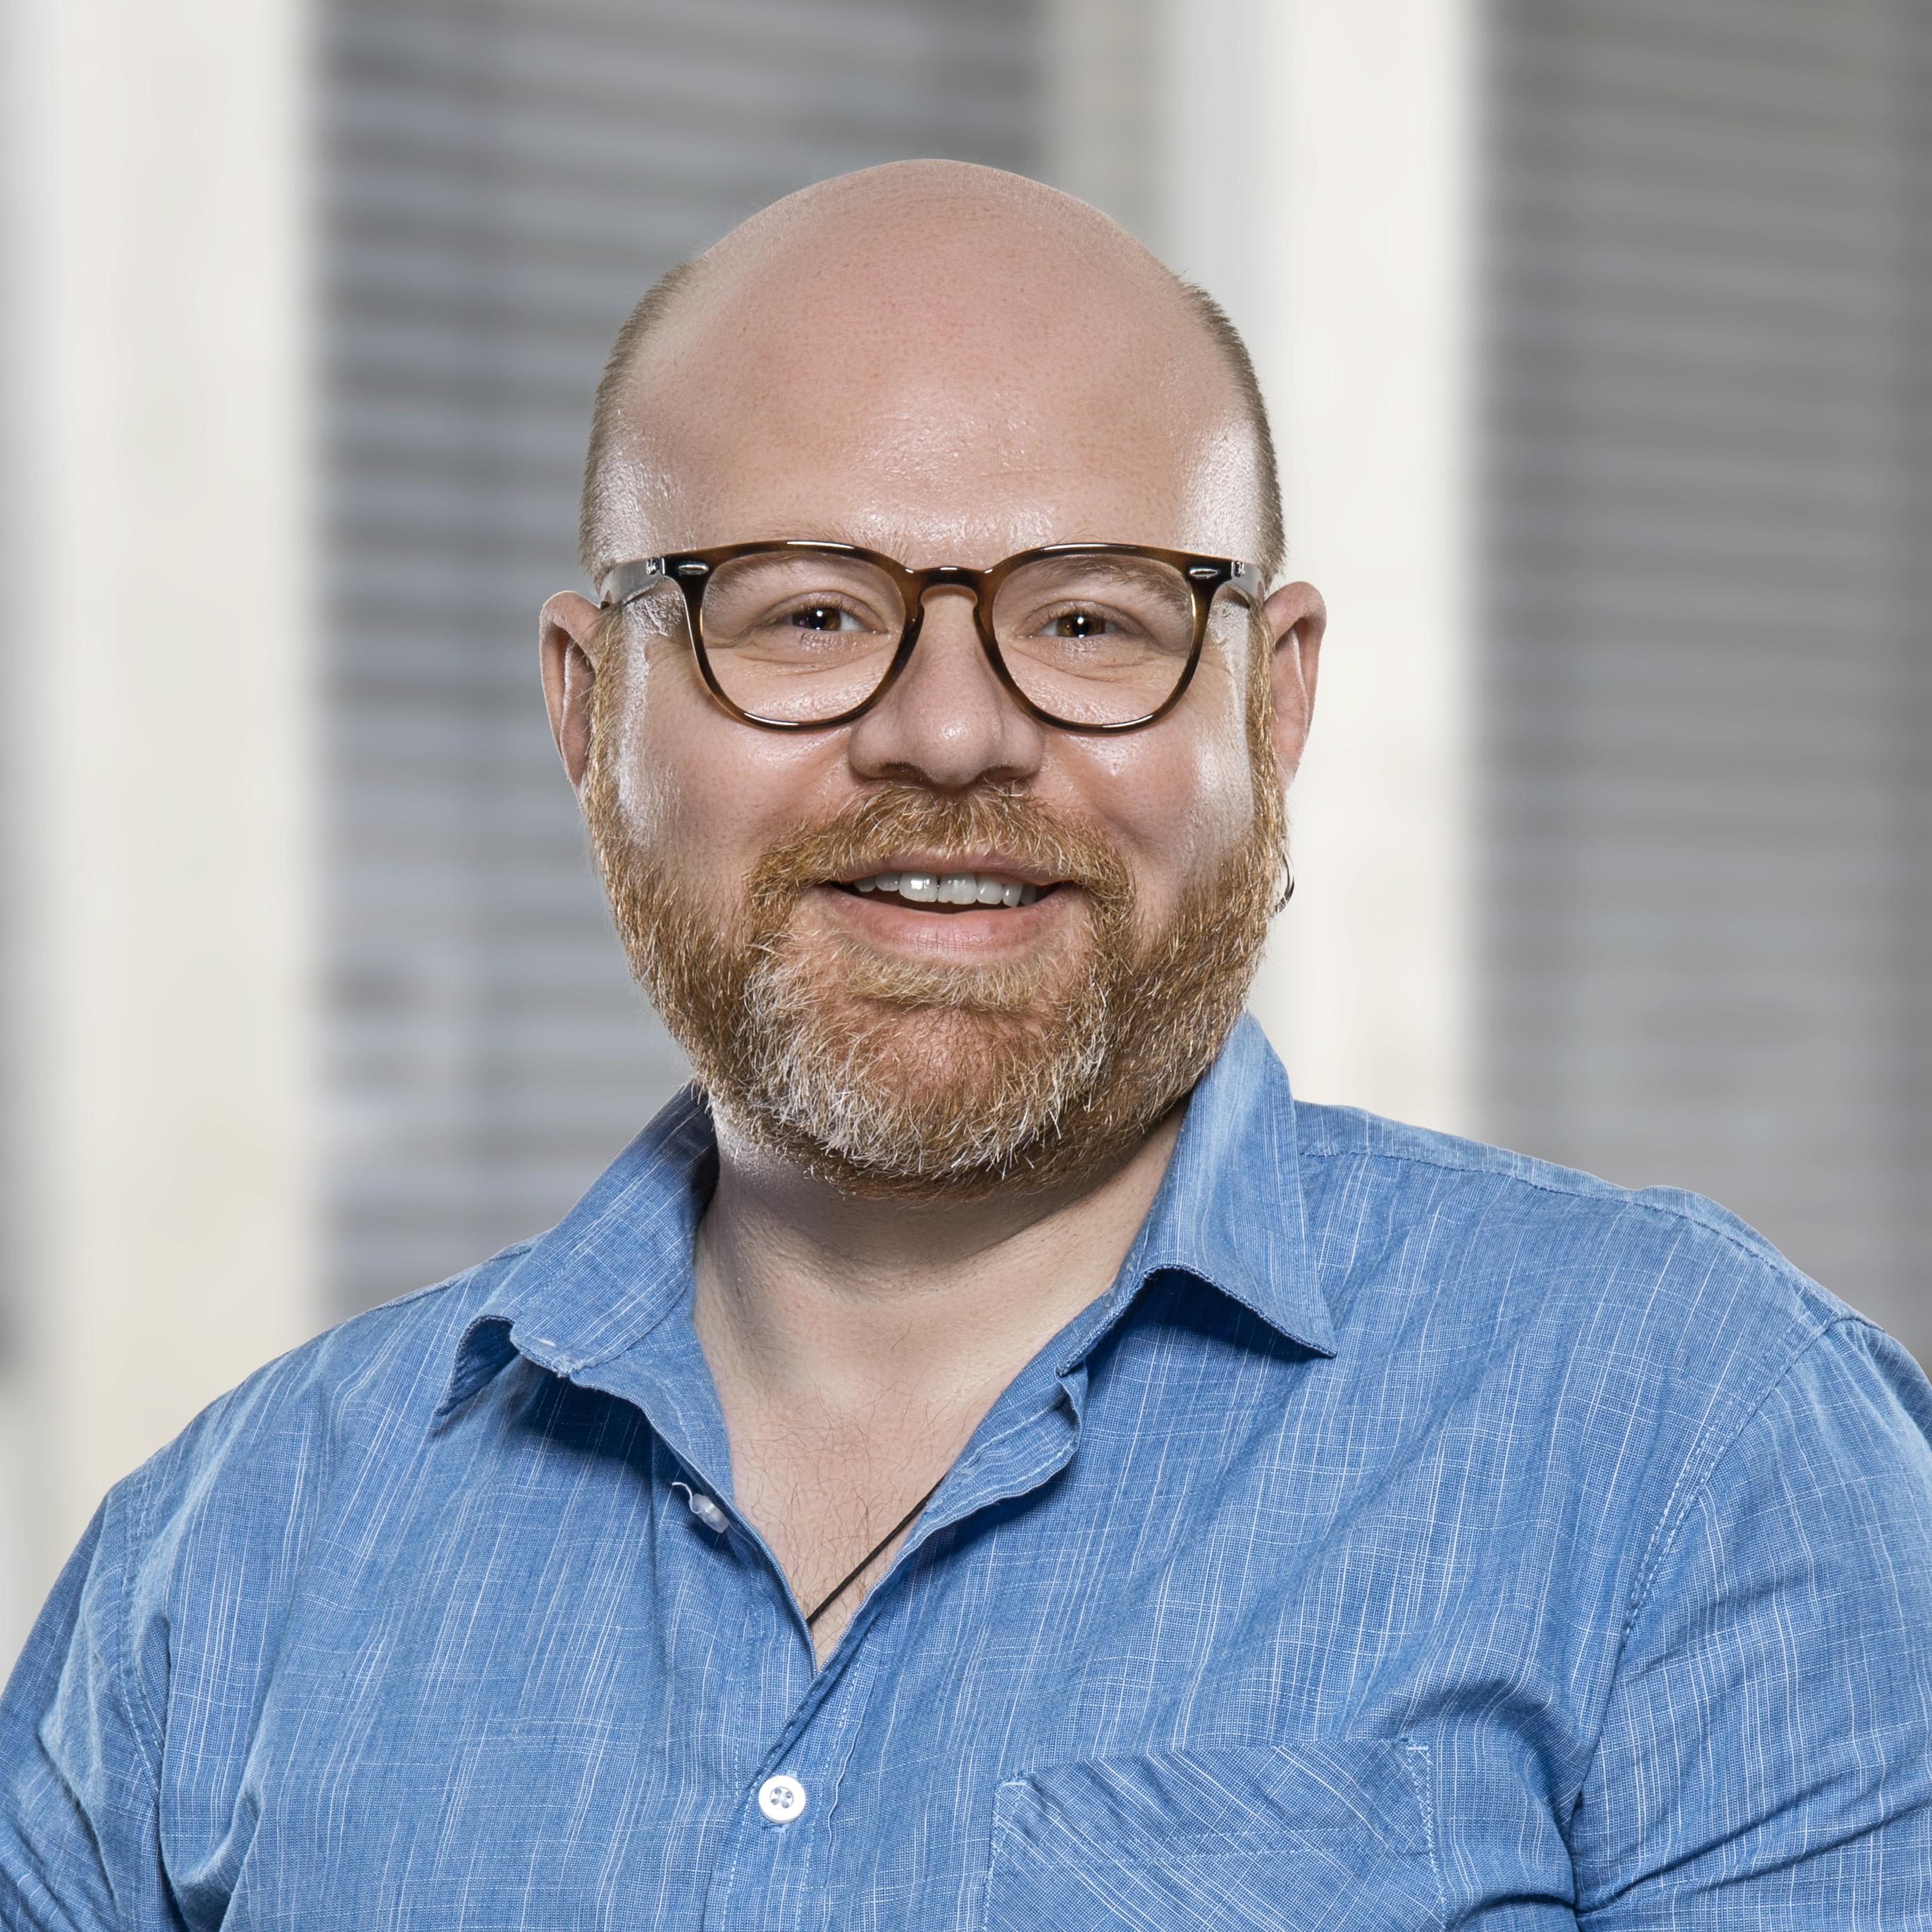 Lutz Speidel-Flache